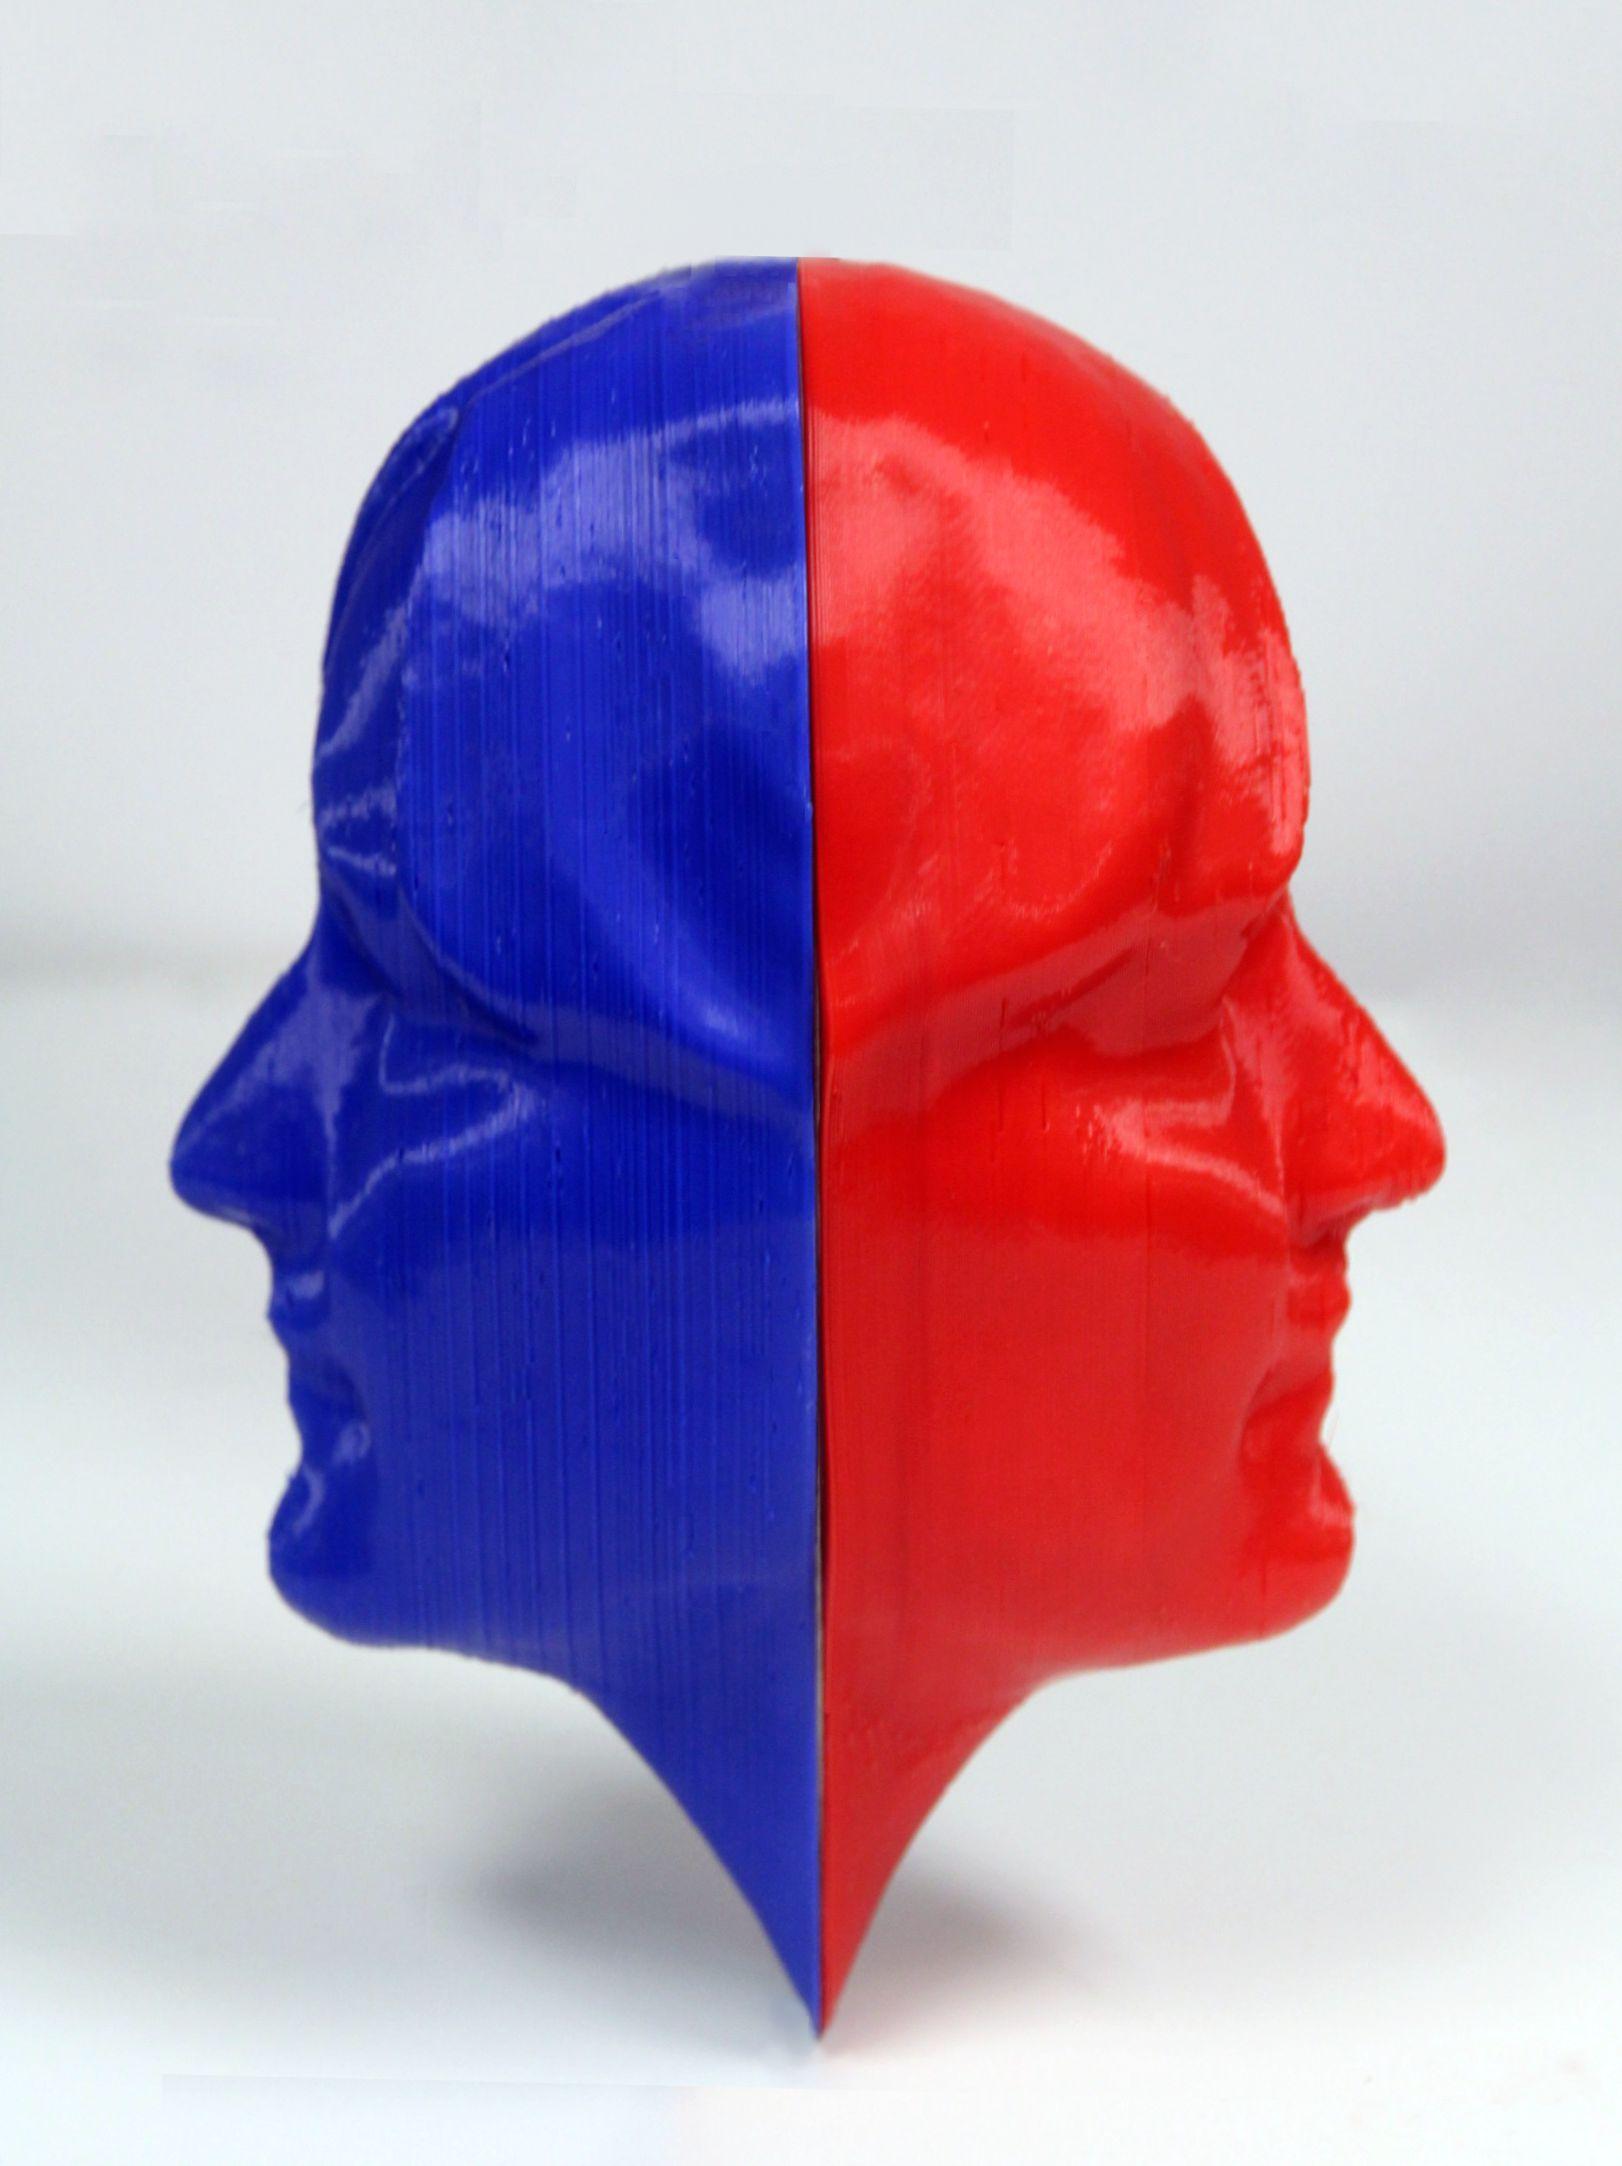 America: A Divided Self